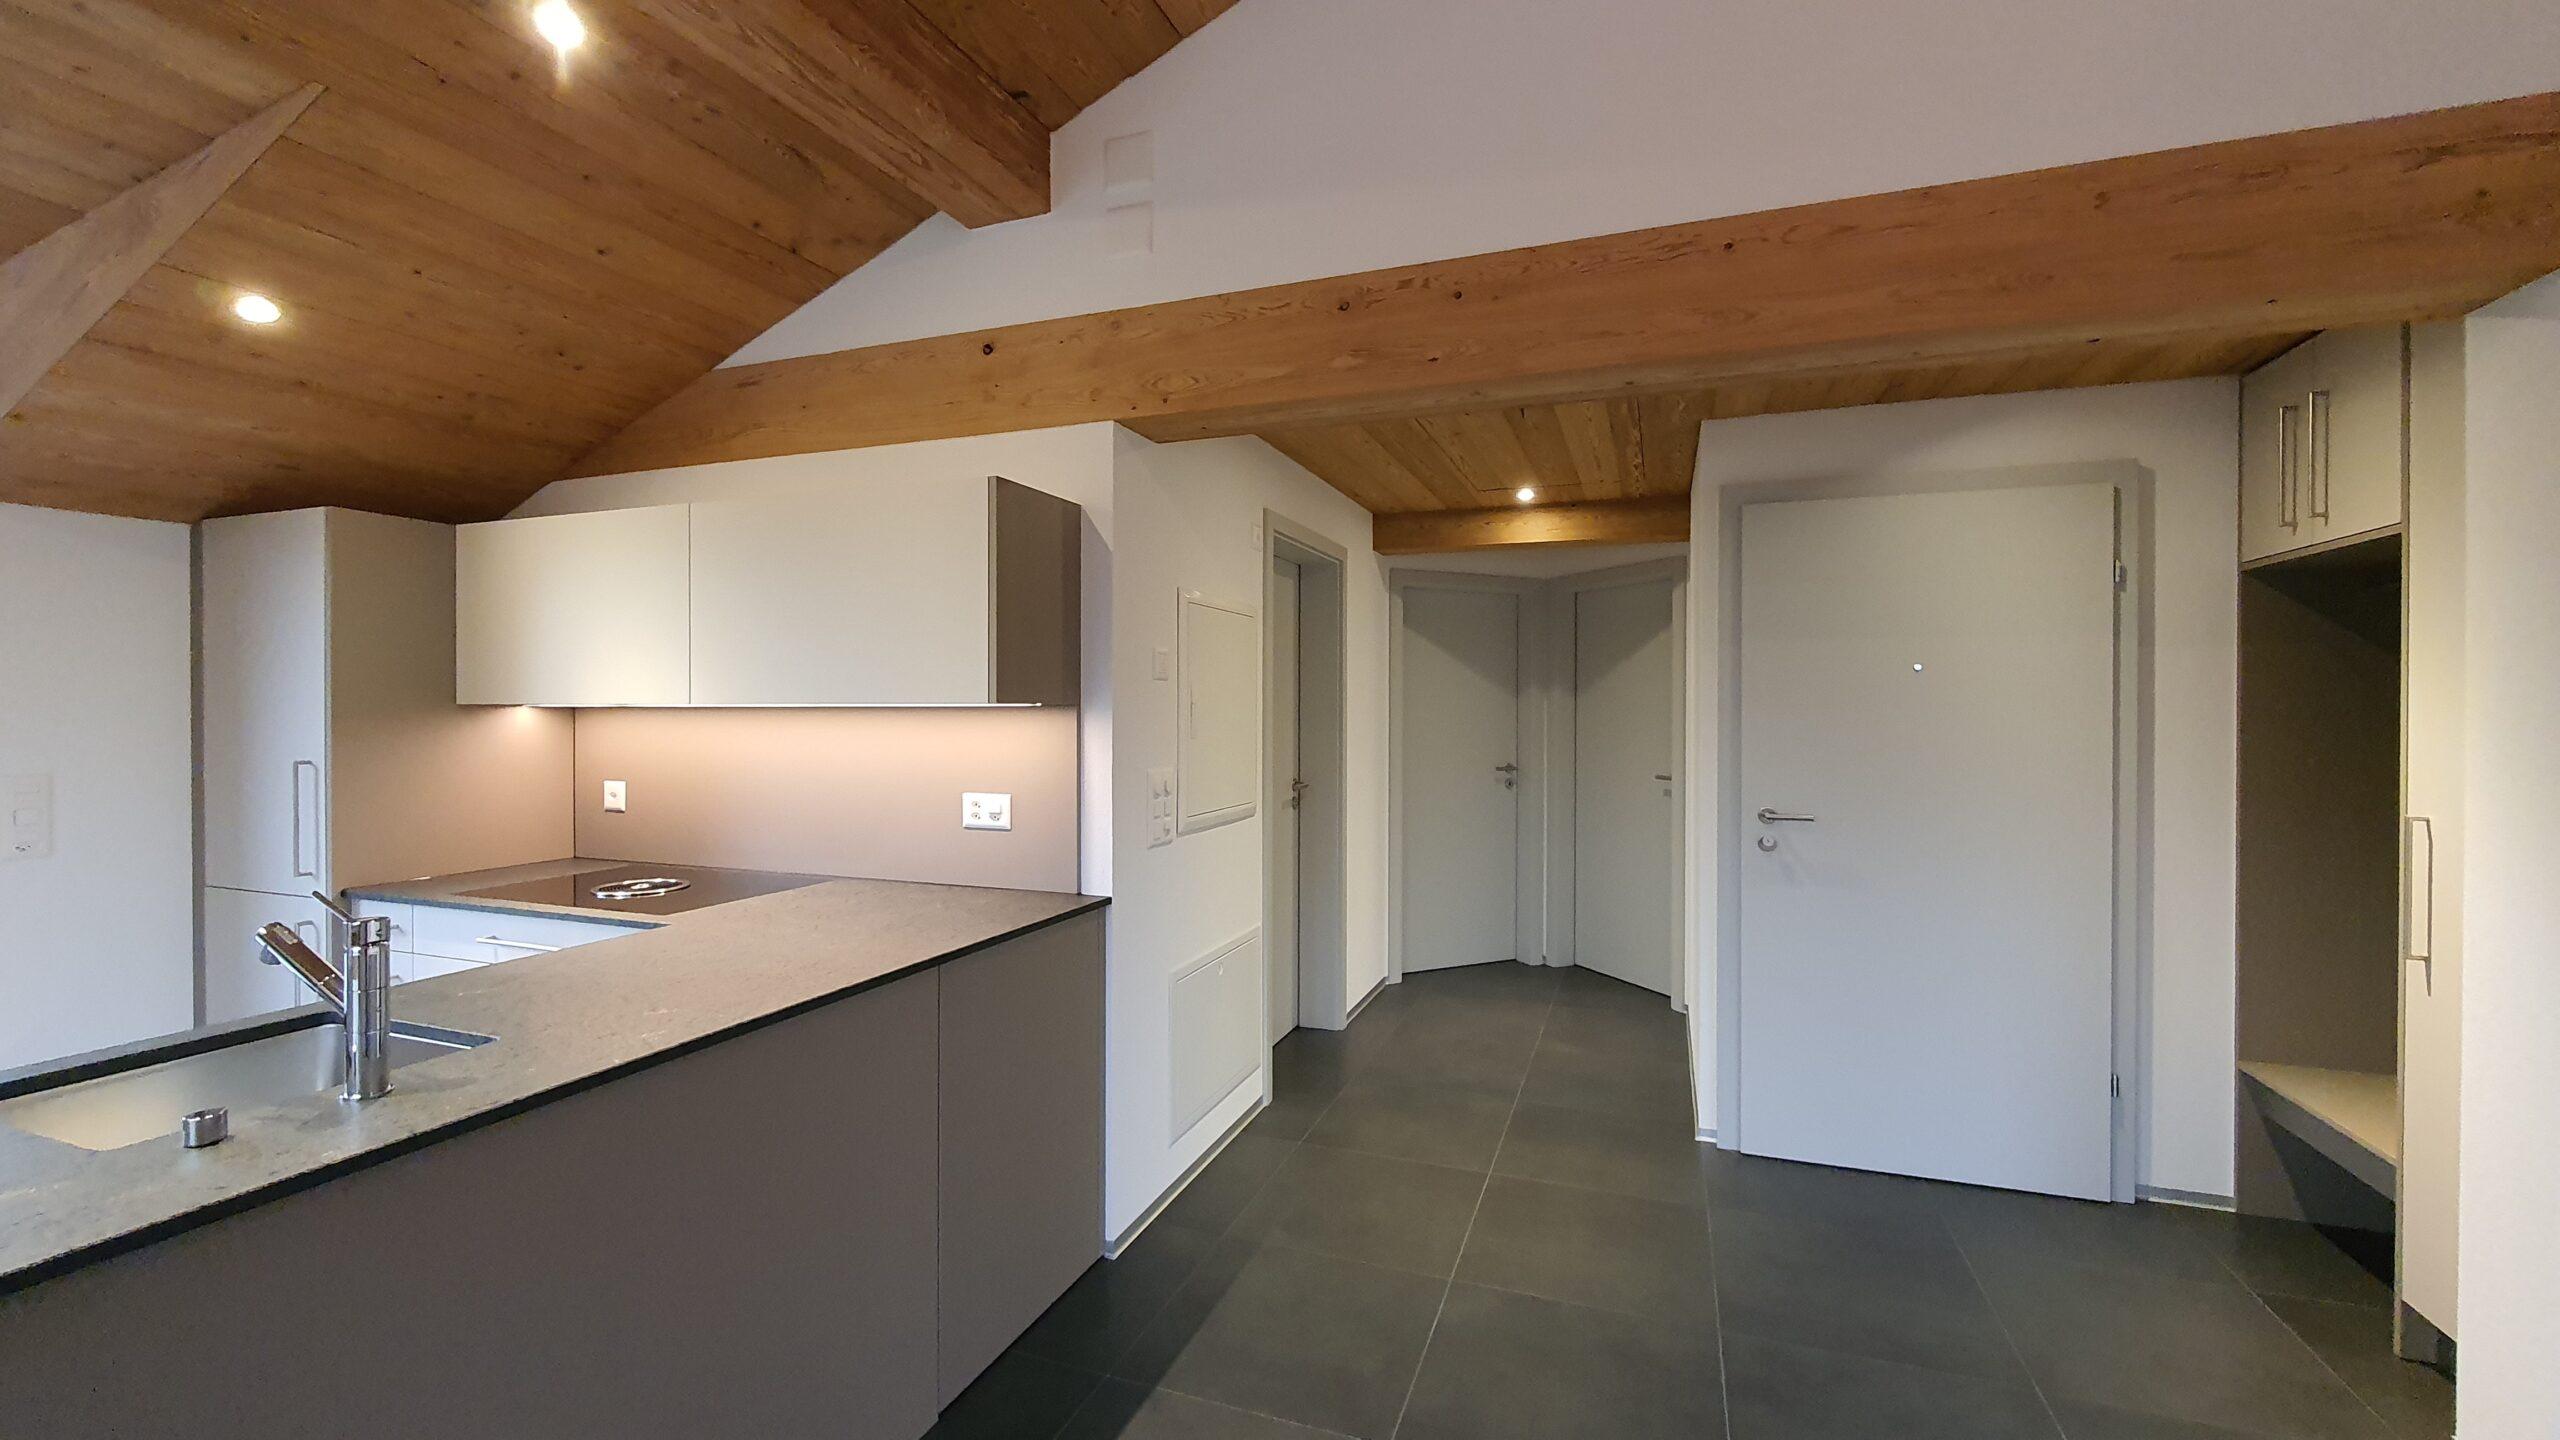 Wooddesign_Holzdesign_Innenausbau_ Umbau_Altholz_rustikal_modern Holzdecke_Balkenverkleidung_Wandverkleidung_Wohnungumbau_Ausbau Wohnung (4)-min